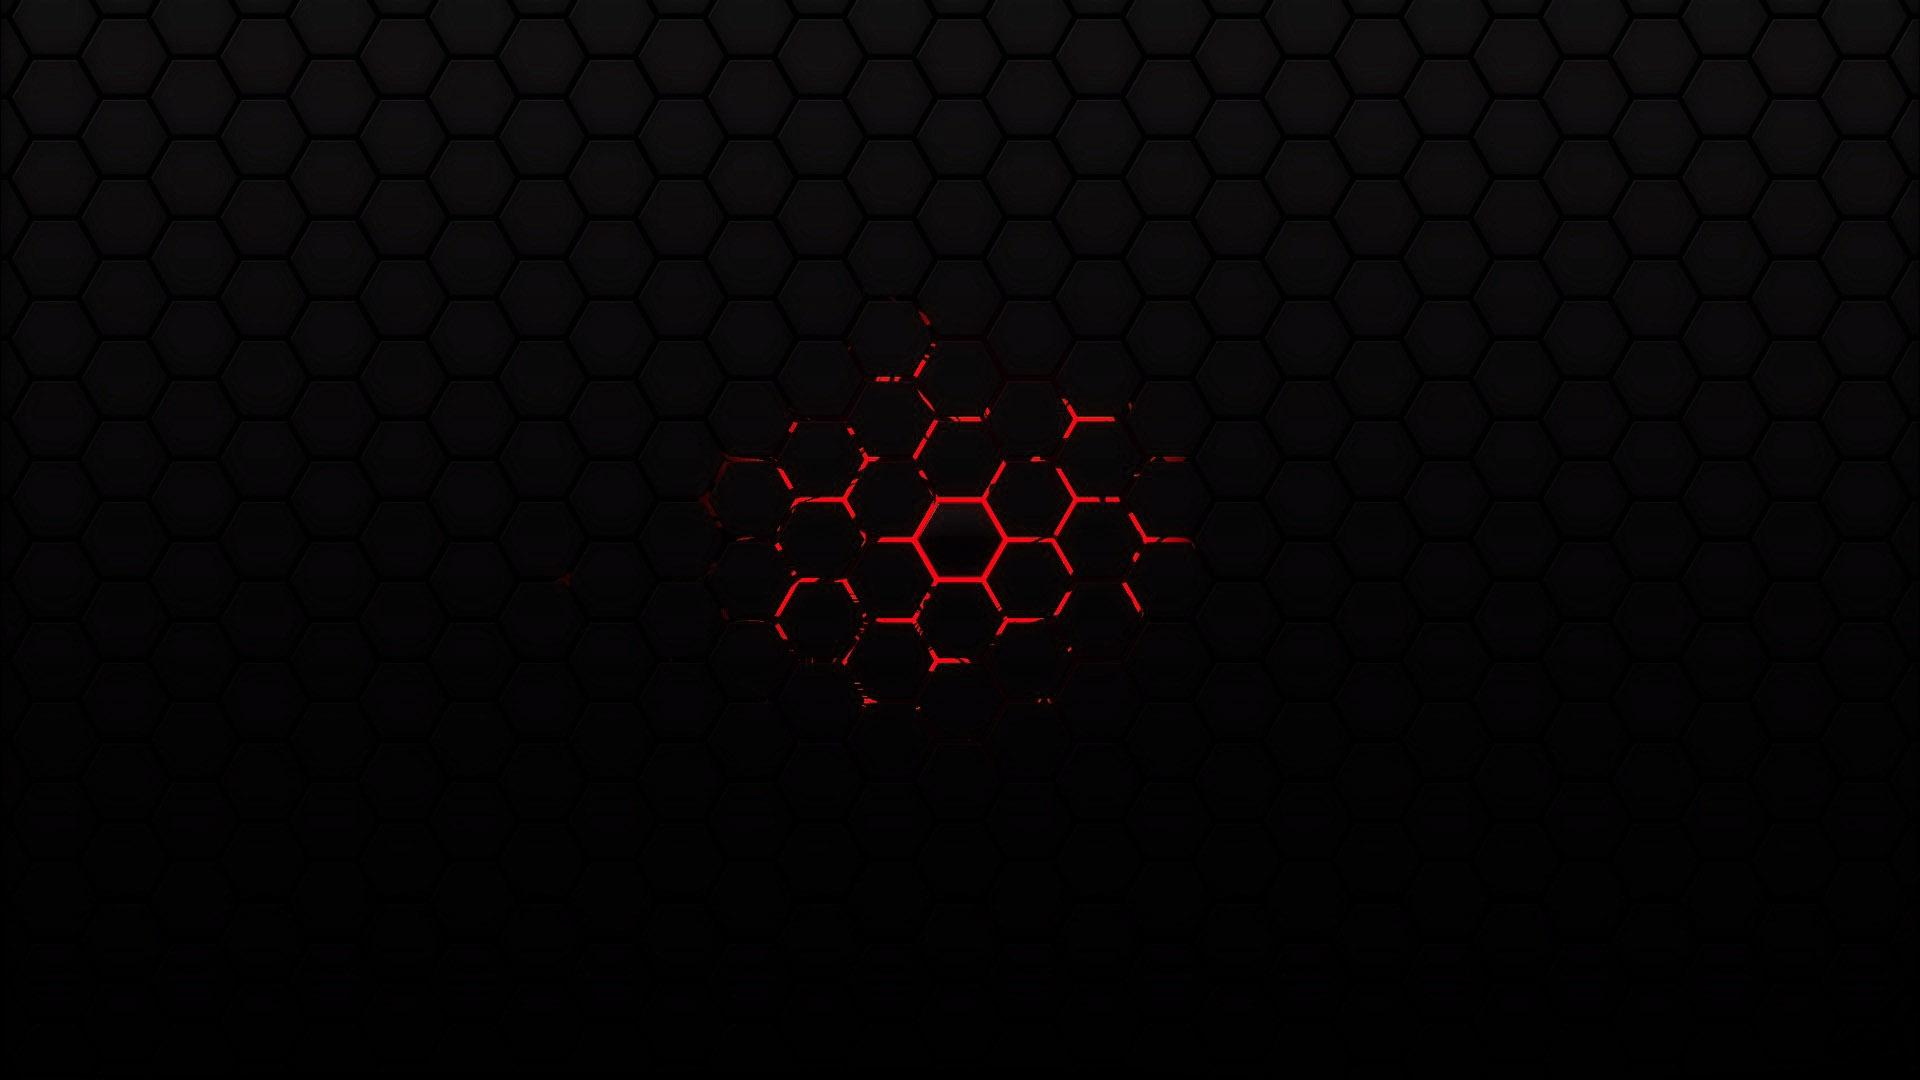 Black Red Wallpaper 1920x1080 Black Red Black Background 1920x1080